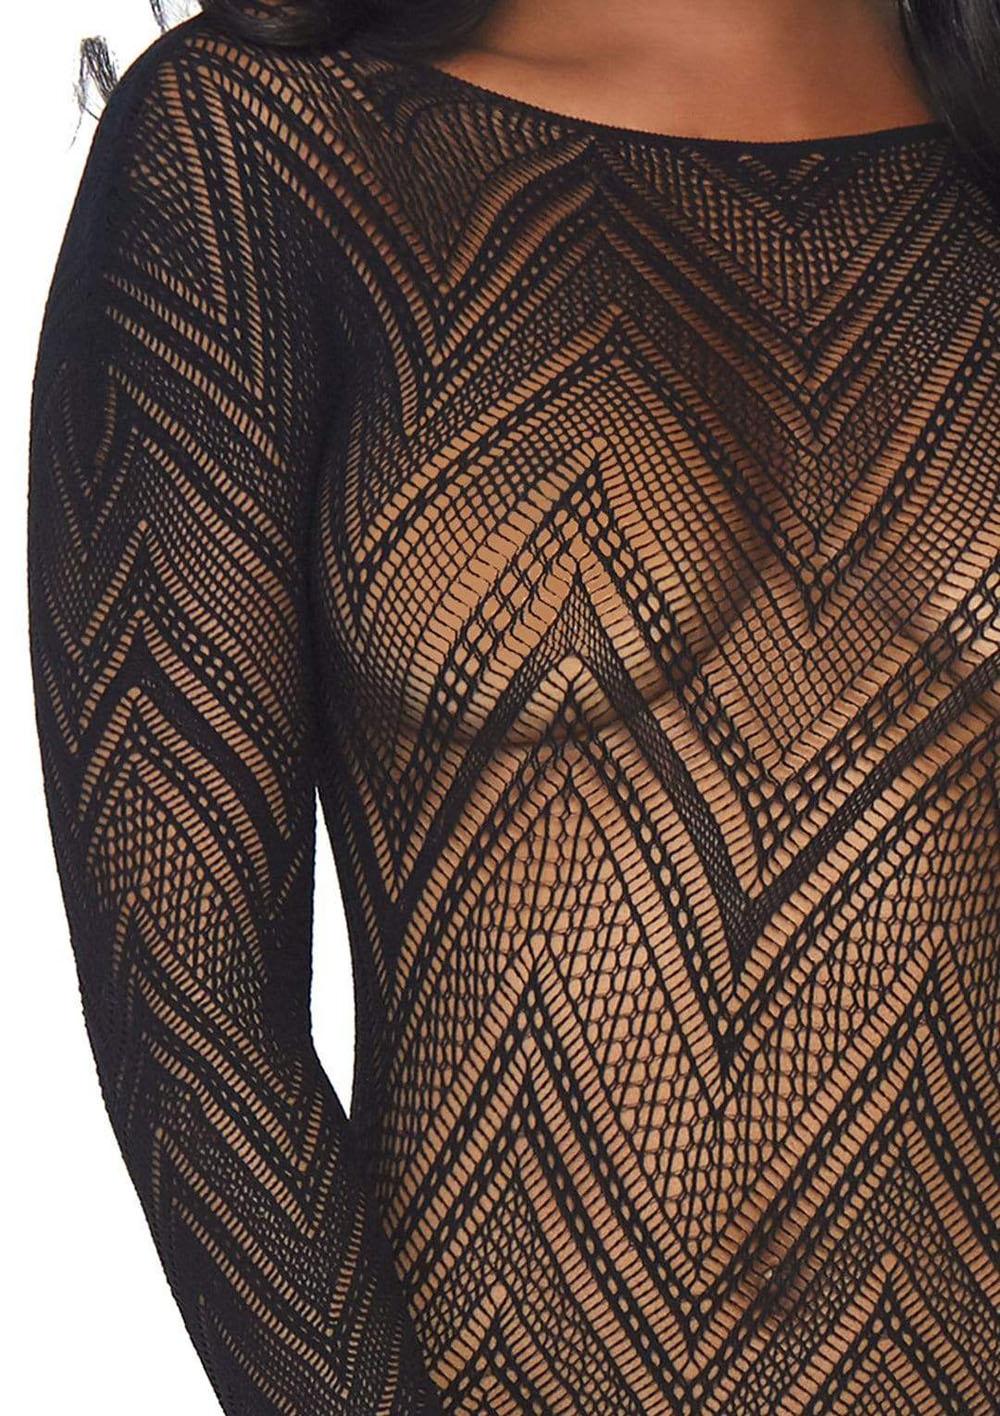 Fishnet Bodycon Dress - One Size - Black